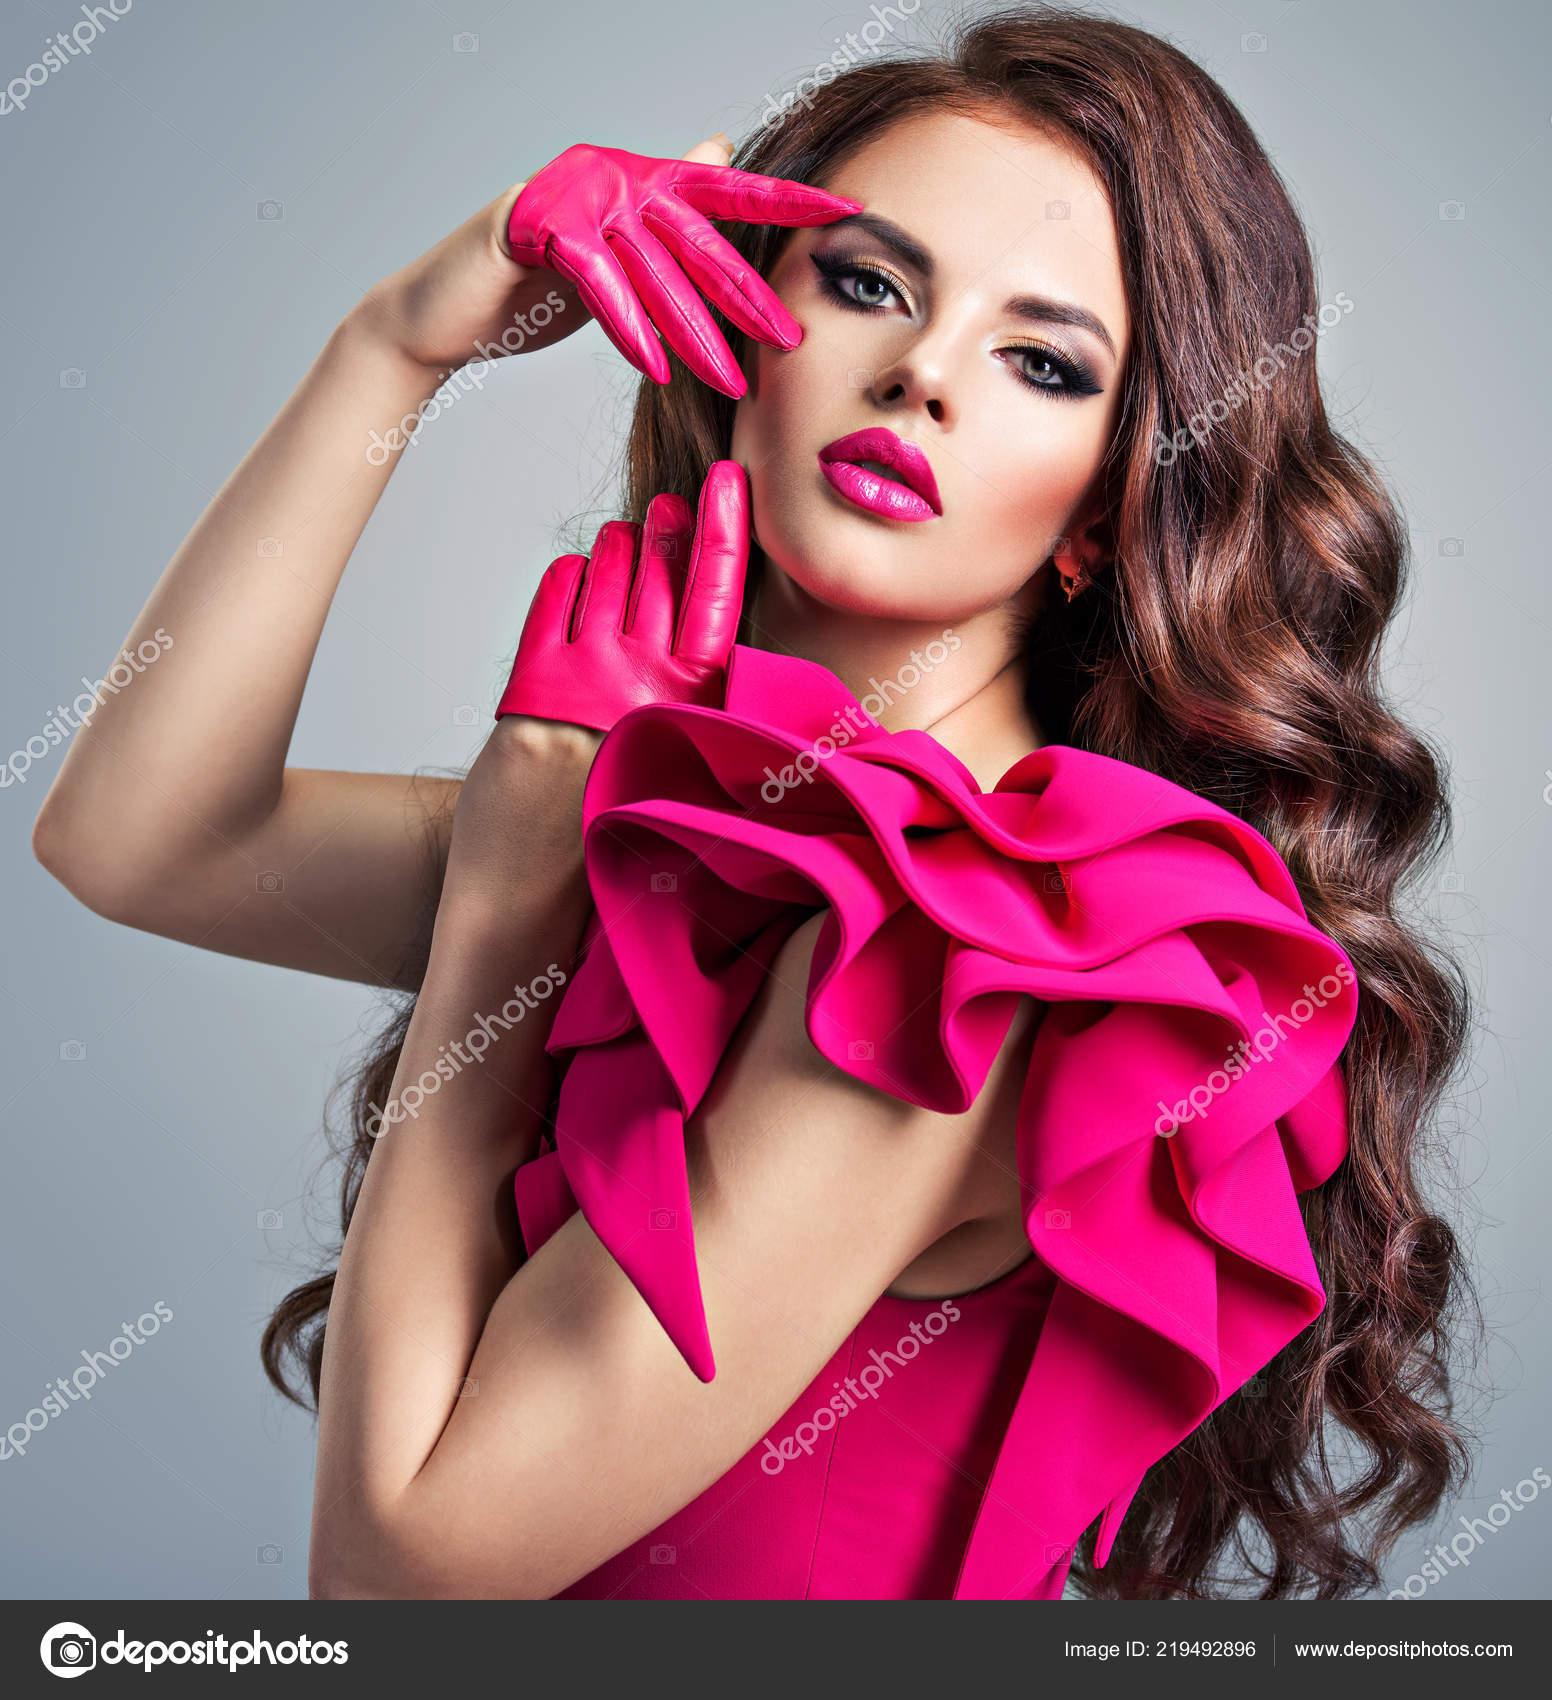 Fashionable Woman Red Dress Creative Eye Makeup Closeup Portrait